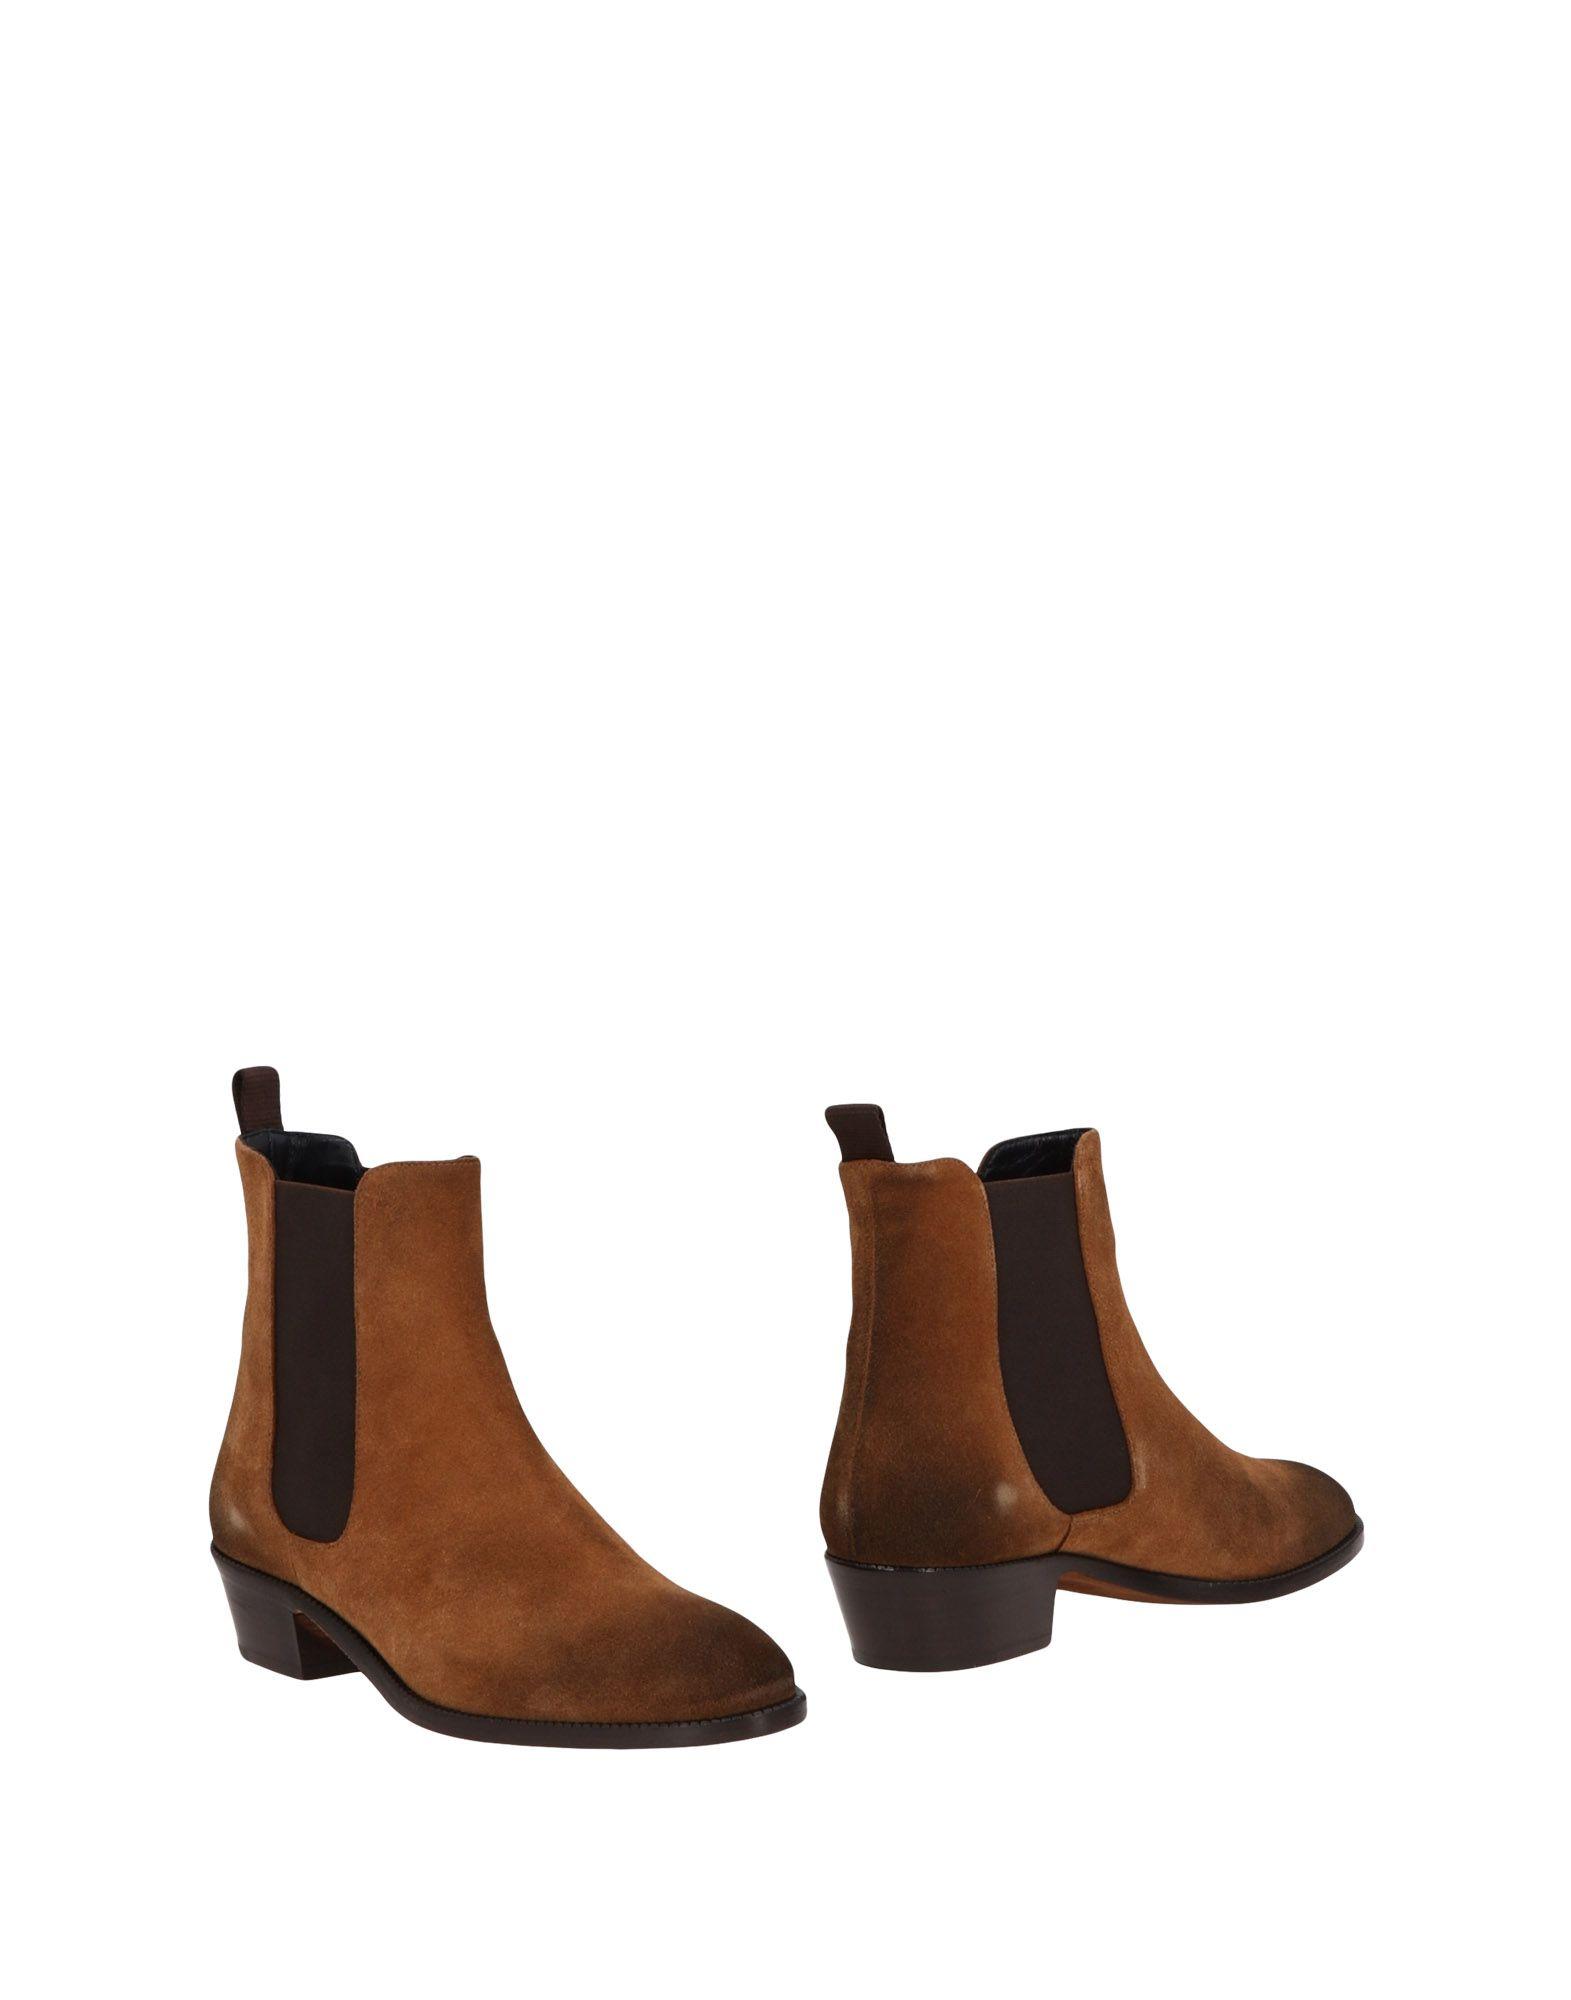 La Corte Della Pelle By Franco Ballin Chelsea Boots Damen  11477735LS Heiße Schuhe